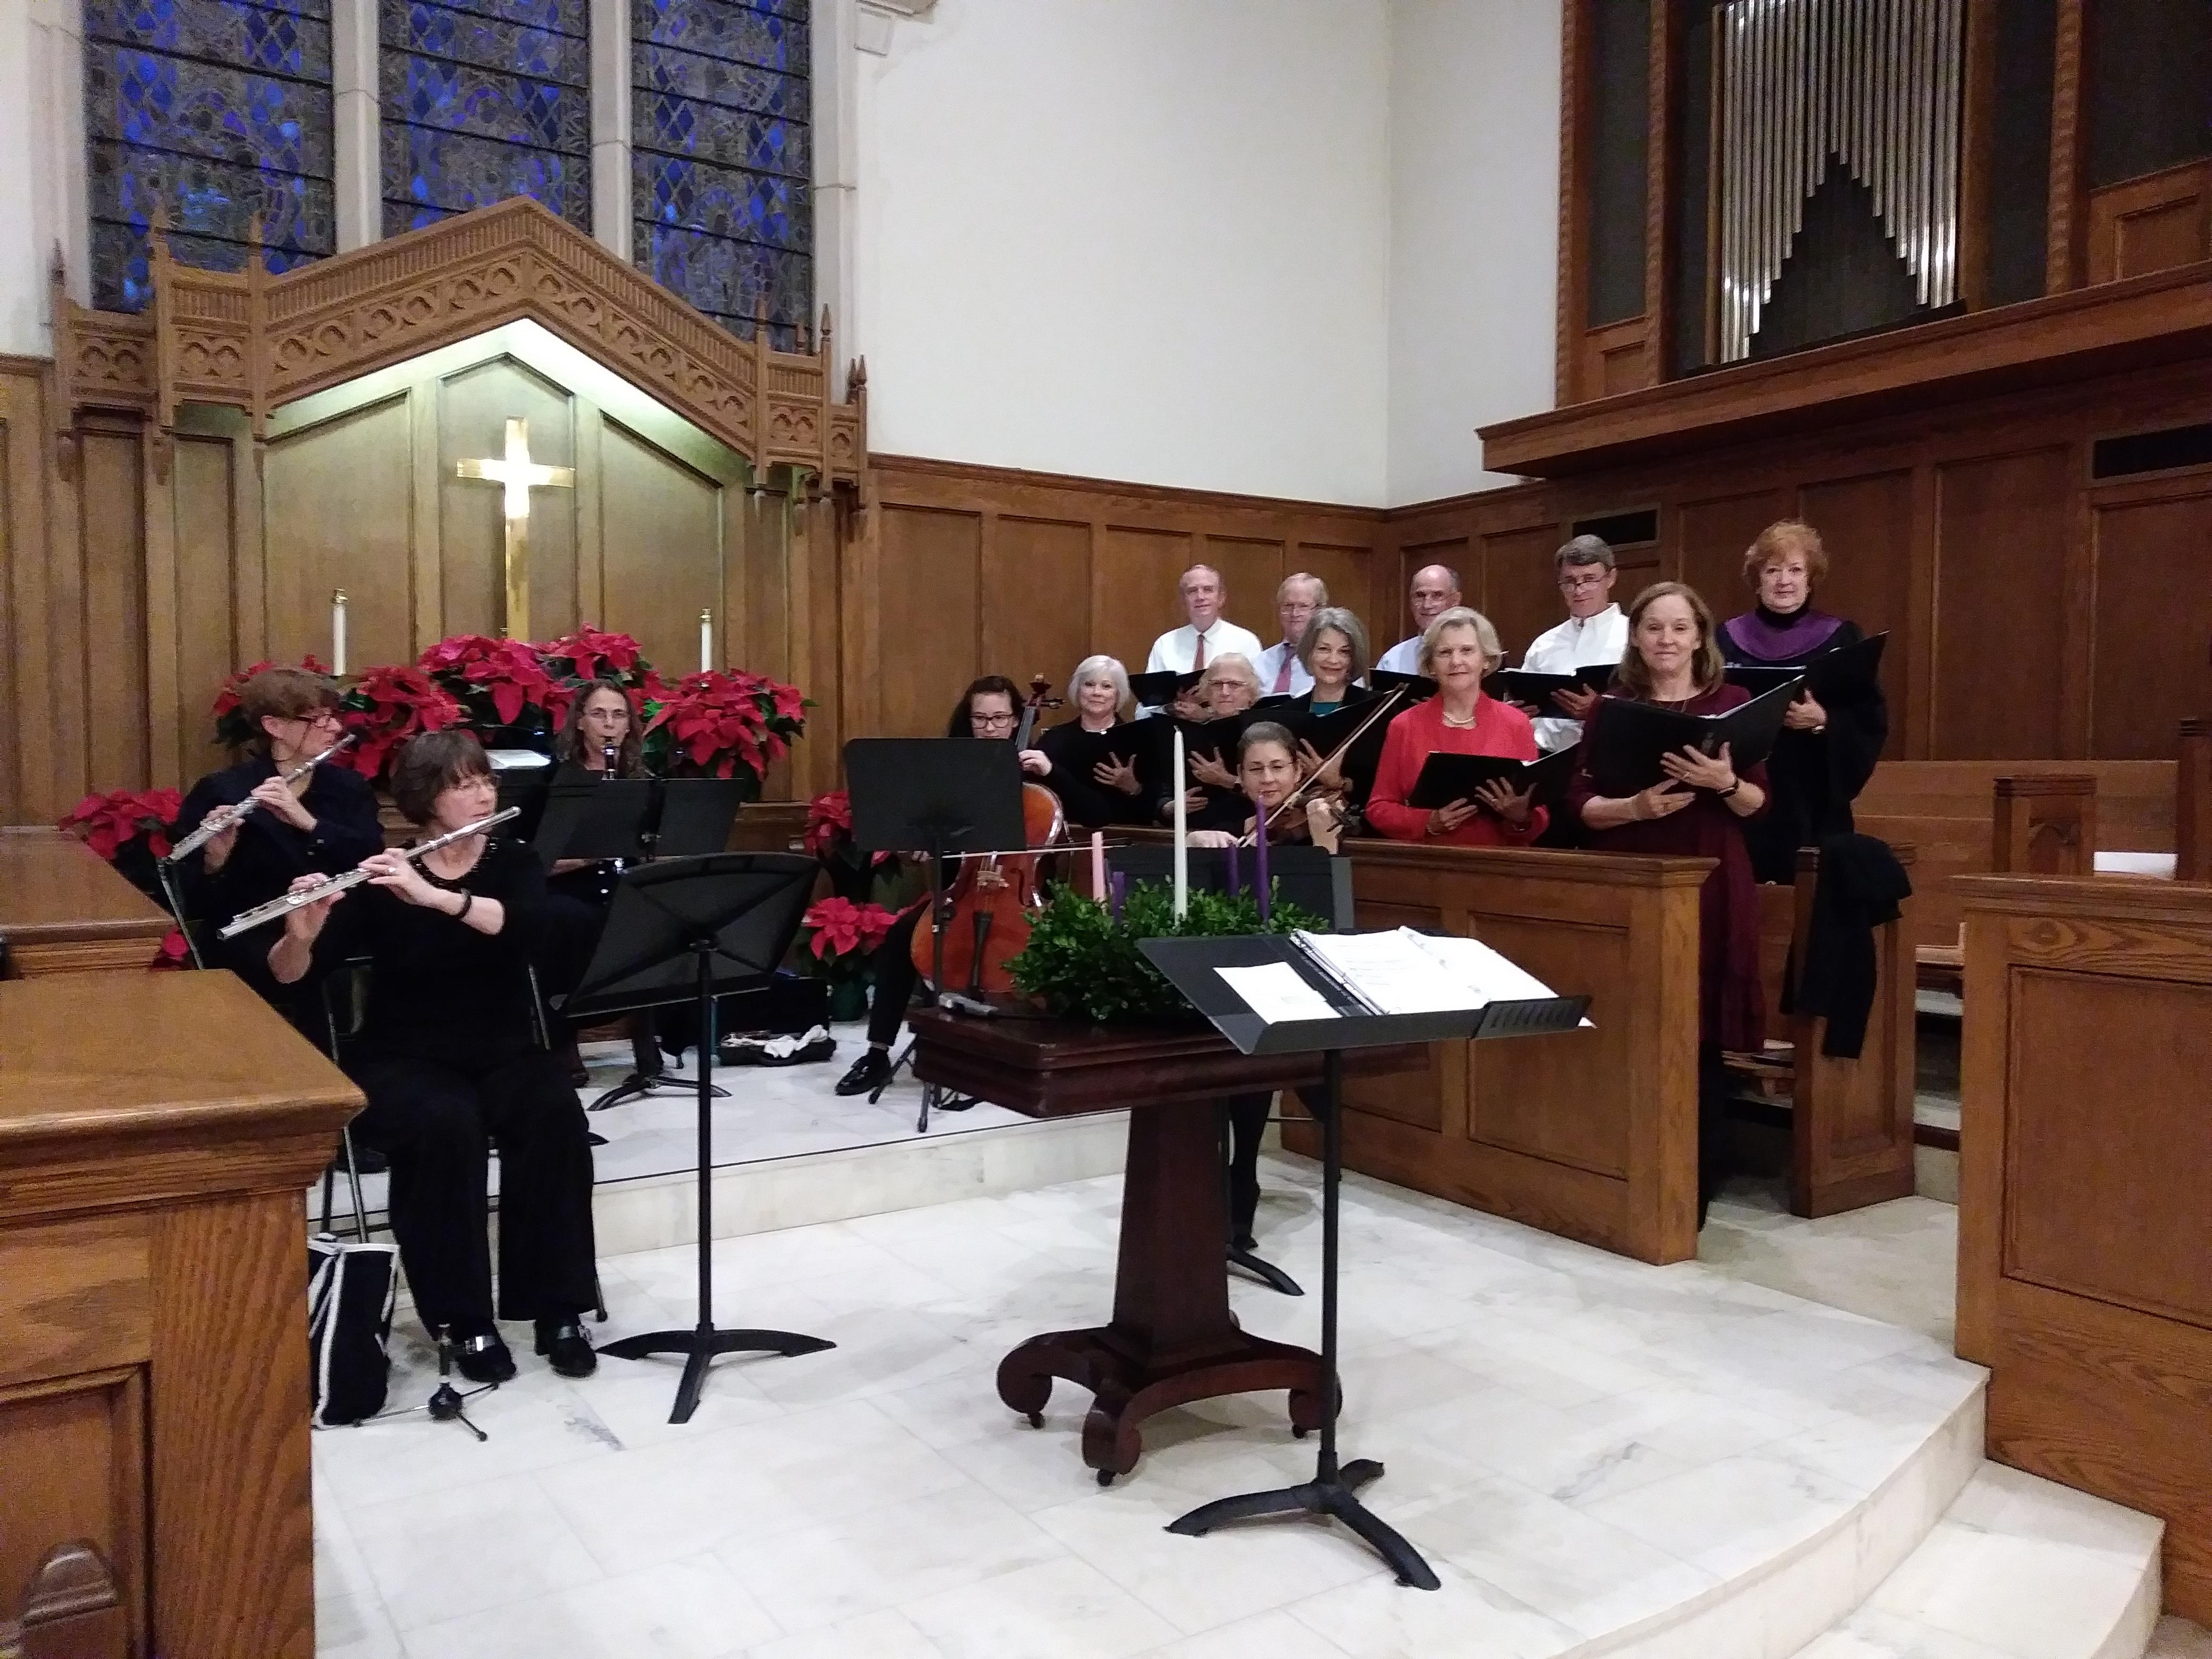 Choir%2012.16.18%20l&c original